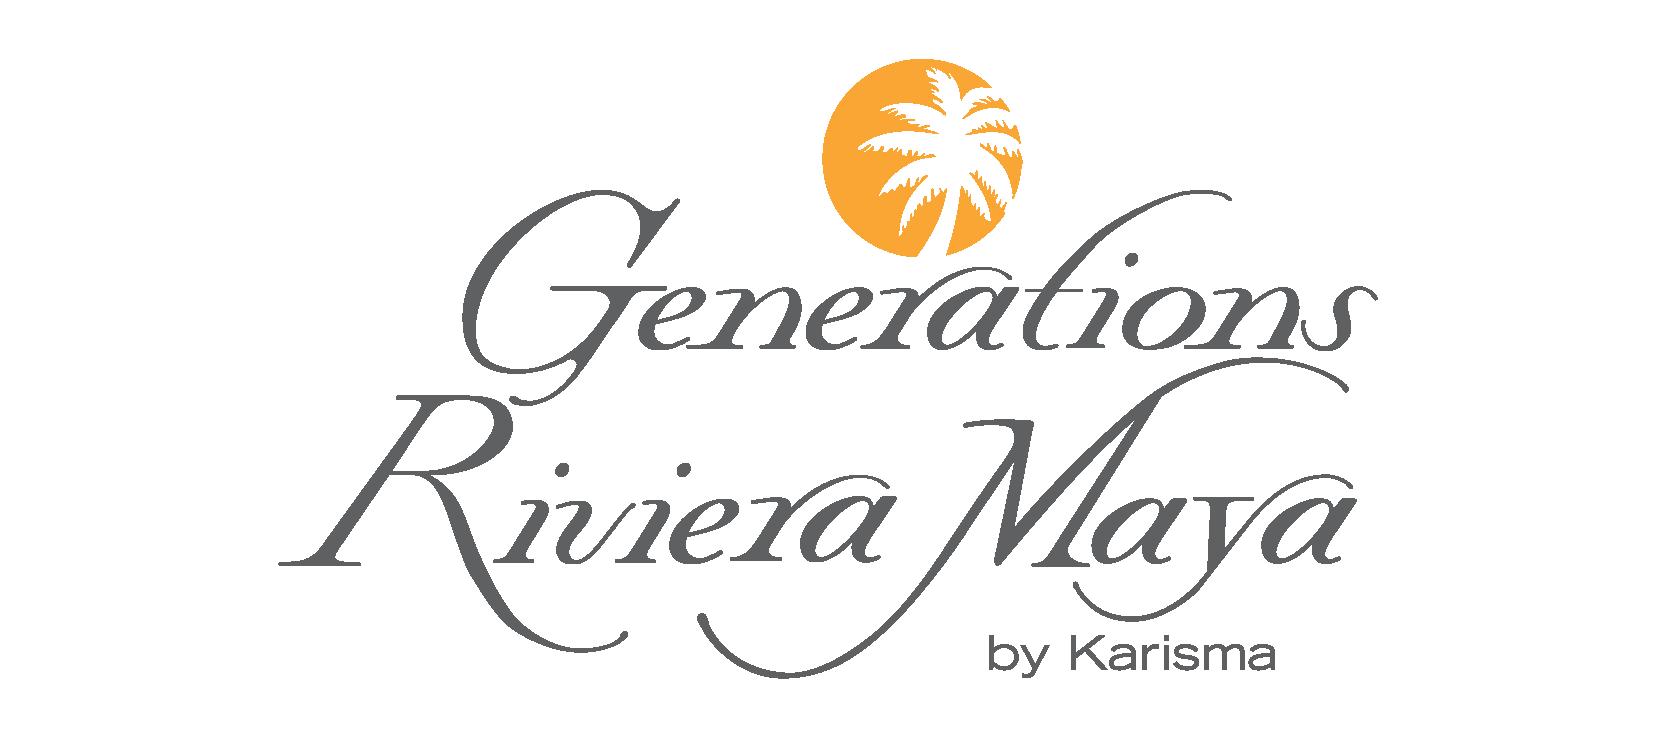 Generations Riviera Maya By Karisma Www Karismahotels Com Home Decor Decals Riviera Maya Generation